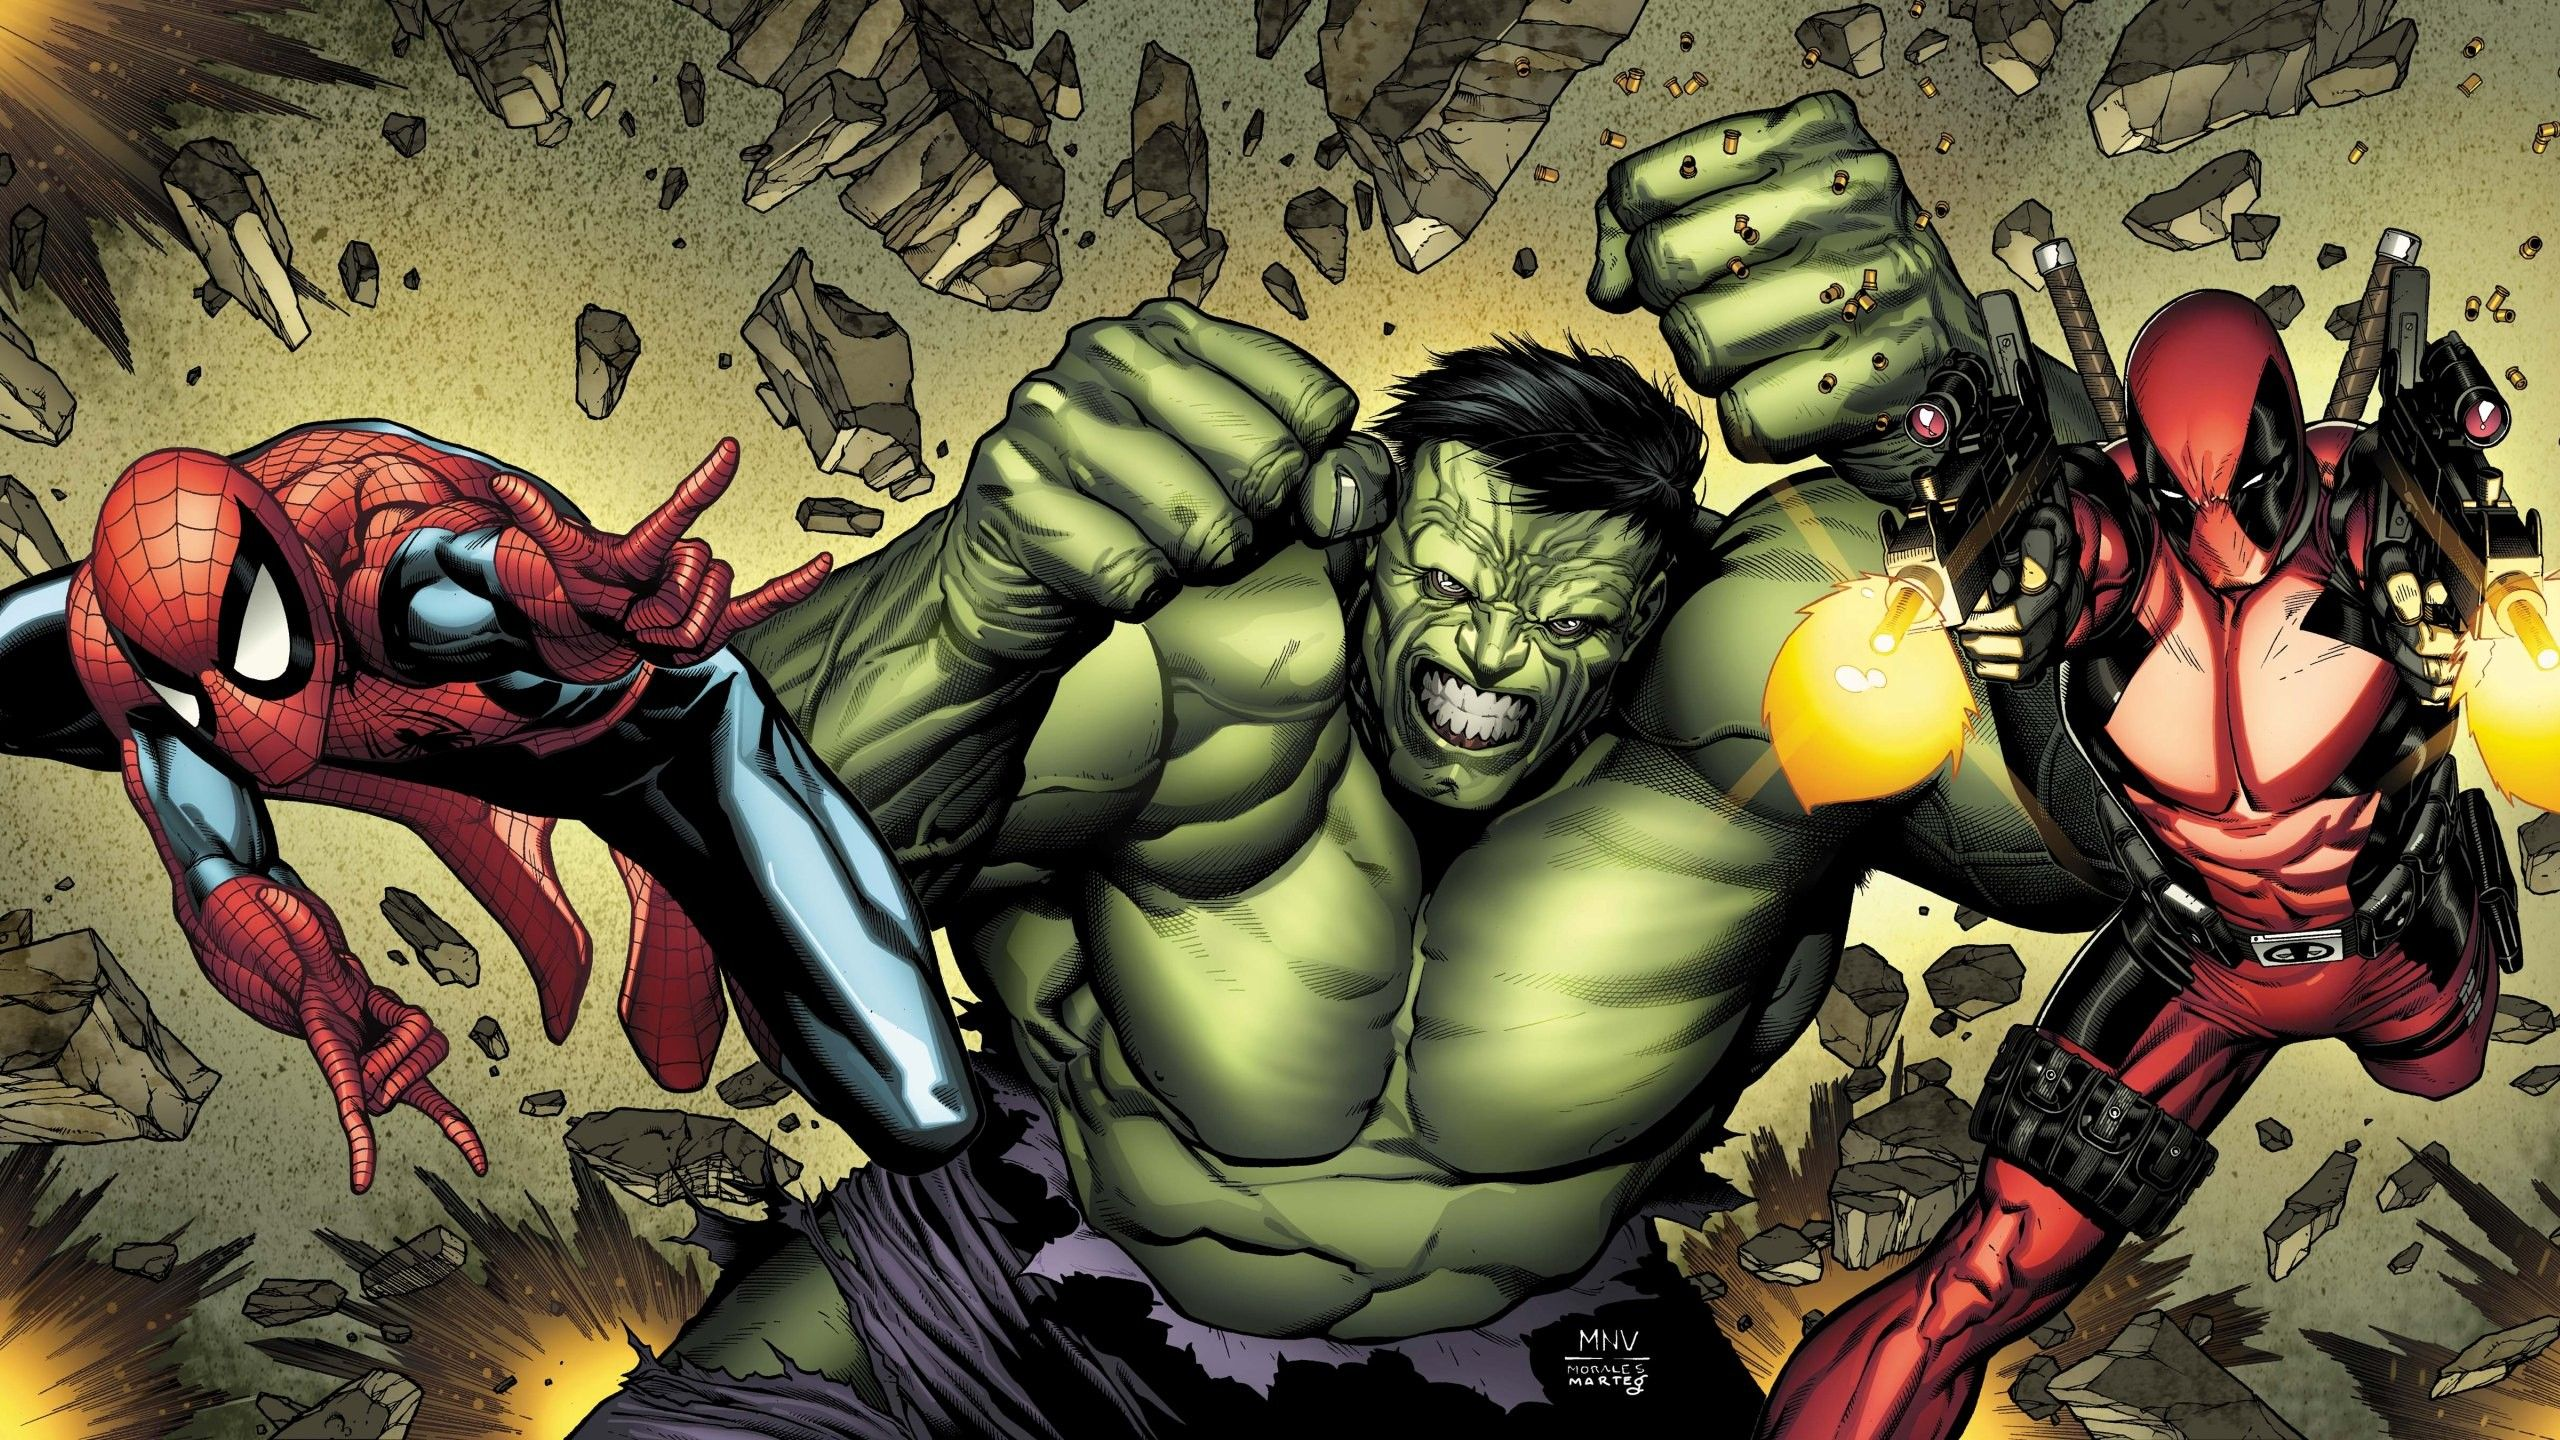 Hulk Vs Deadpool Wallpapers Top Free Hulk Vs Deadpool Backgrounds